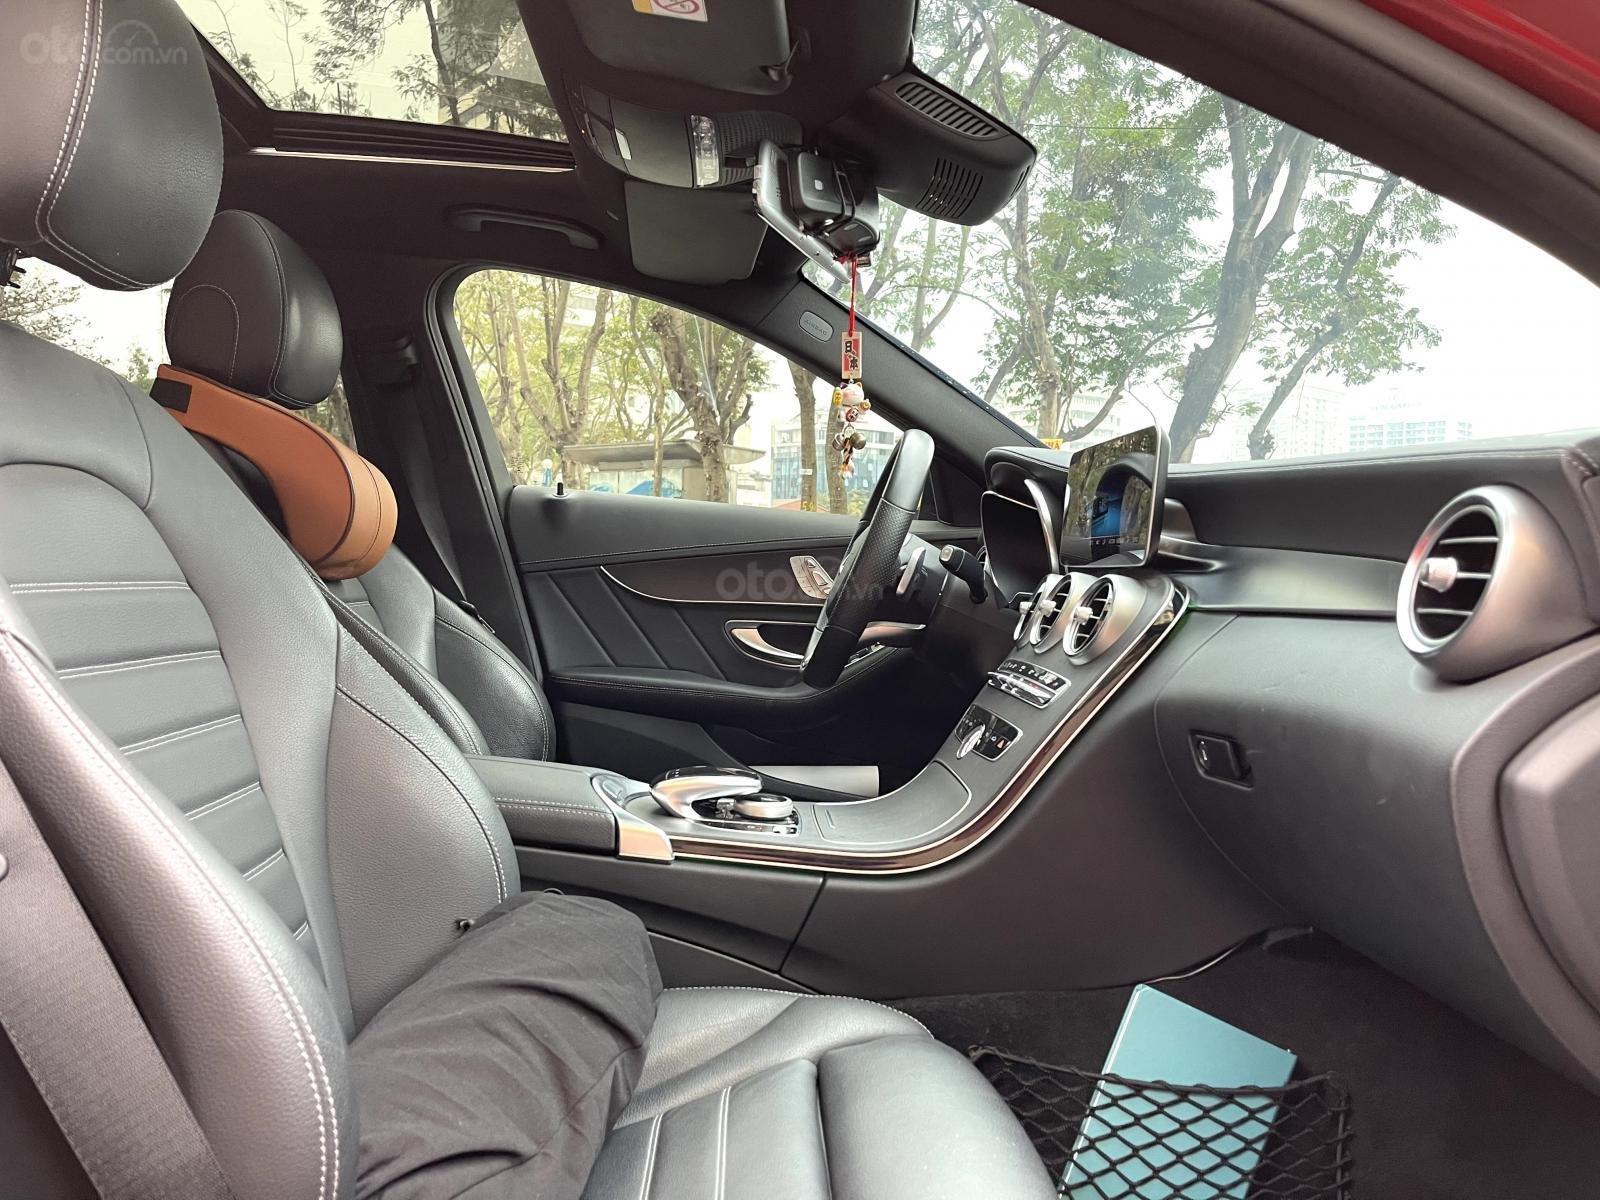 Mercedes Benz C300 AMG model 2019 sản xuất 2018 (9)